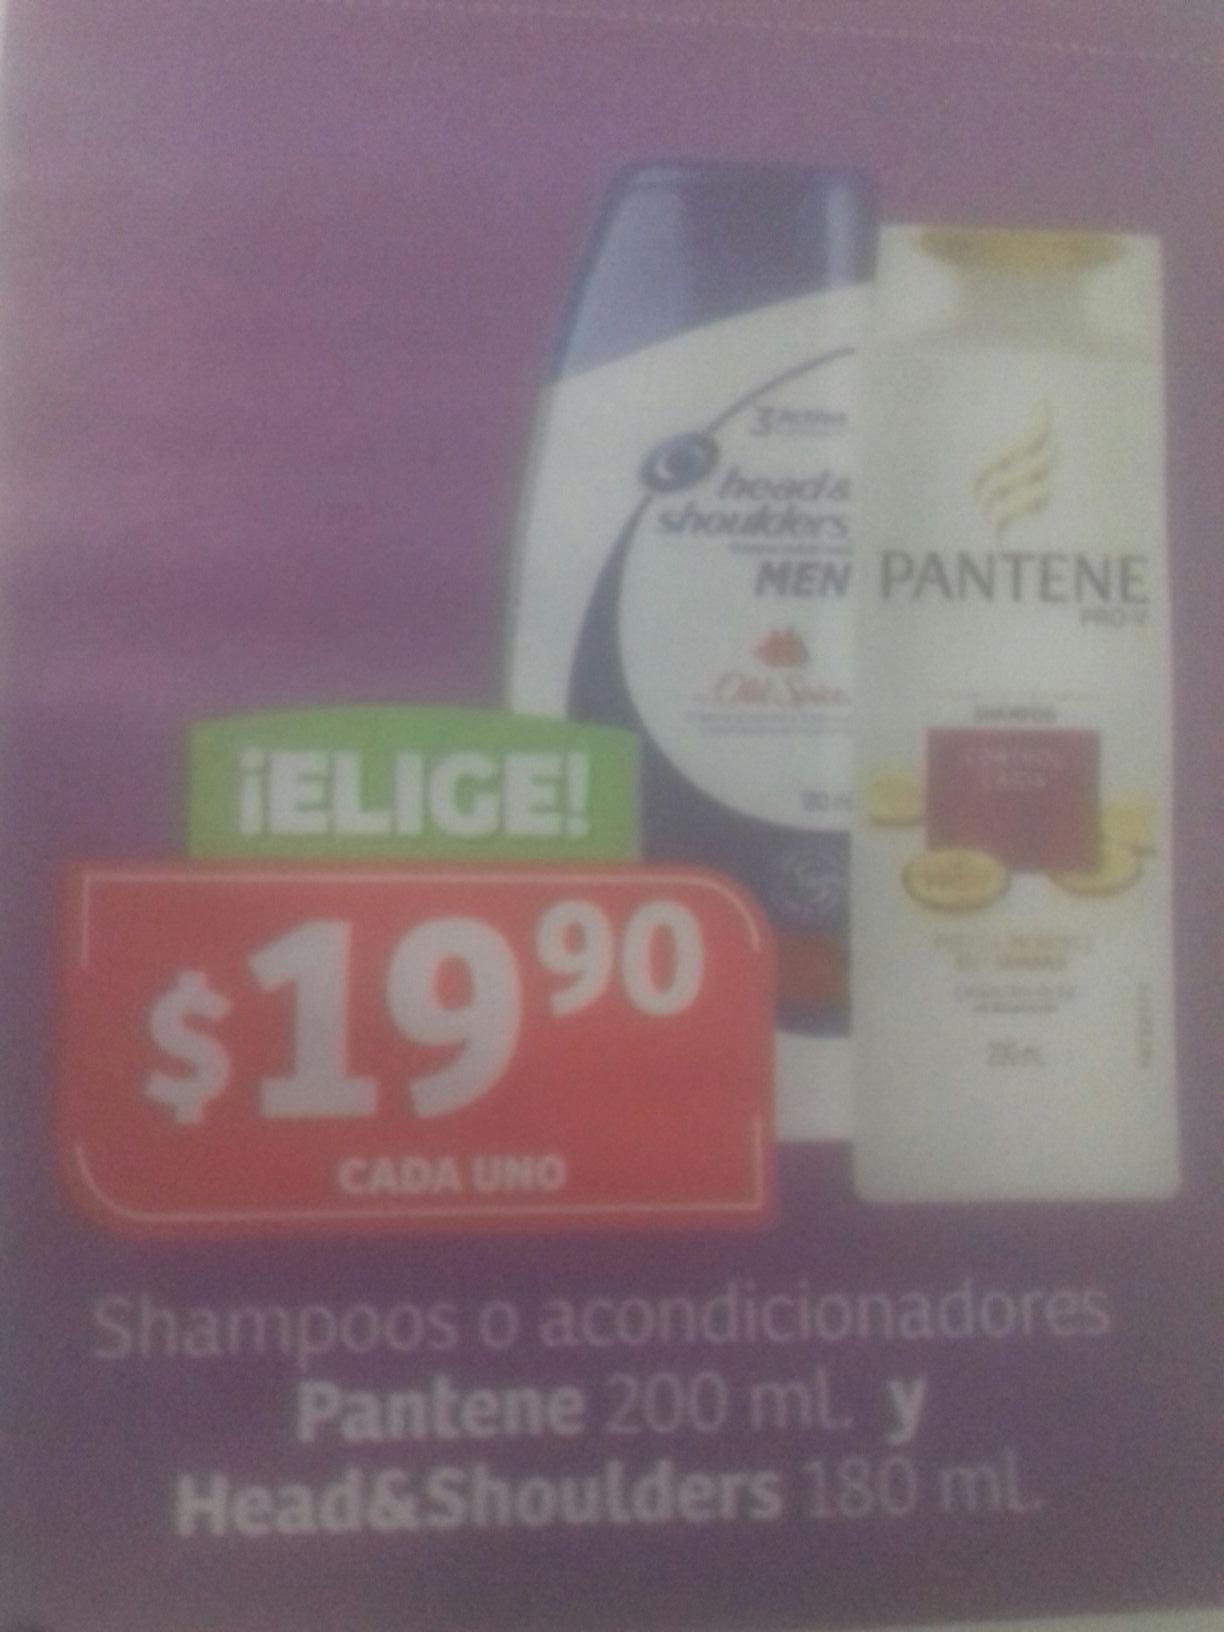 Soriana Shampoo ó acondicionador